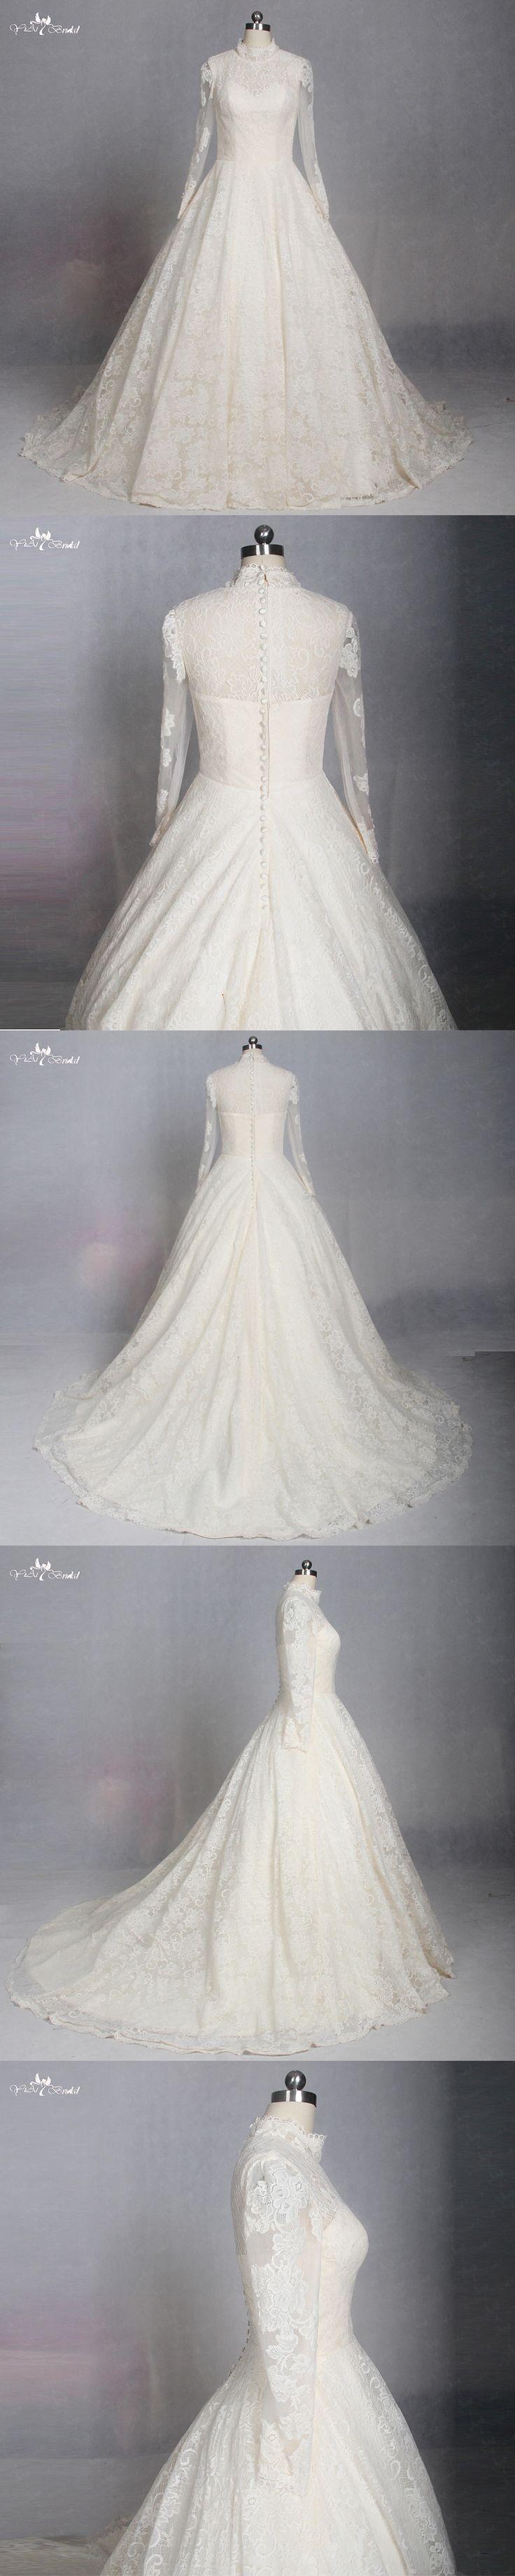 LZ180 Yellow High Neck Long Sleeve Wedding Dress Muslim Wedding Dresses Lace Dress Vestido De Noiva